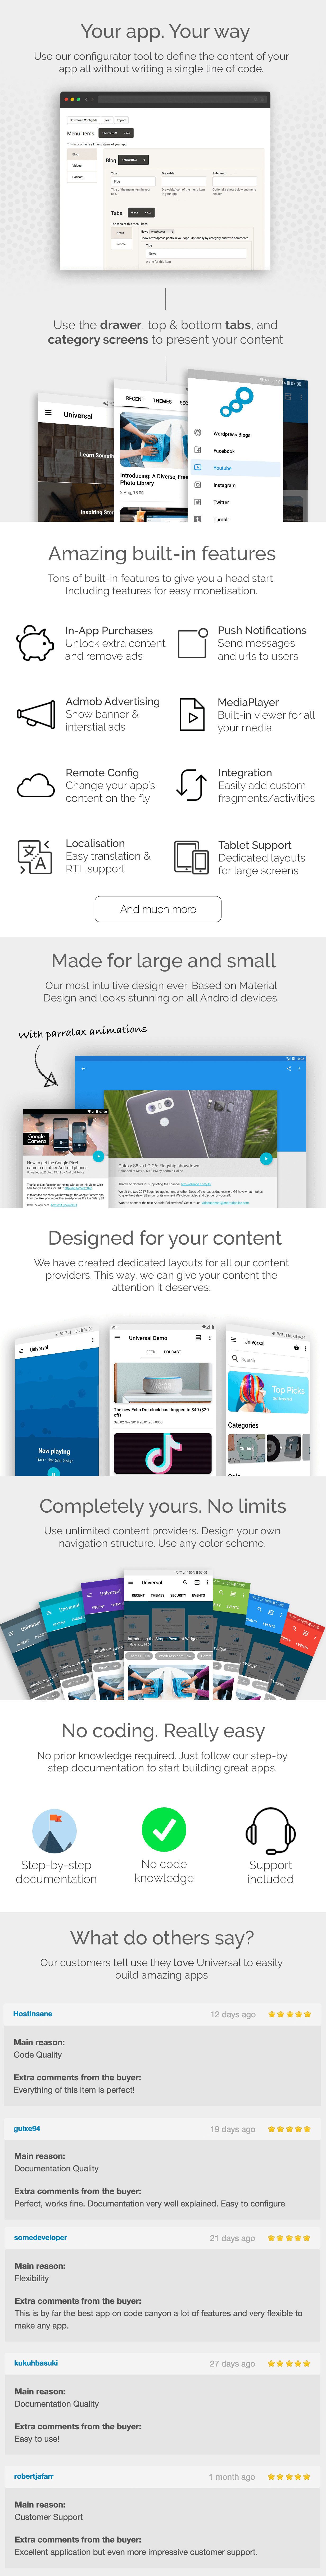 Universal - Full Multi-Purpose Android App - 12